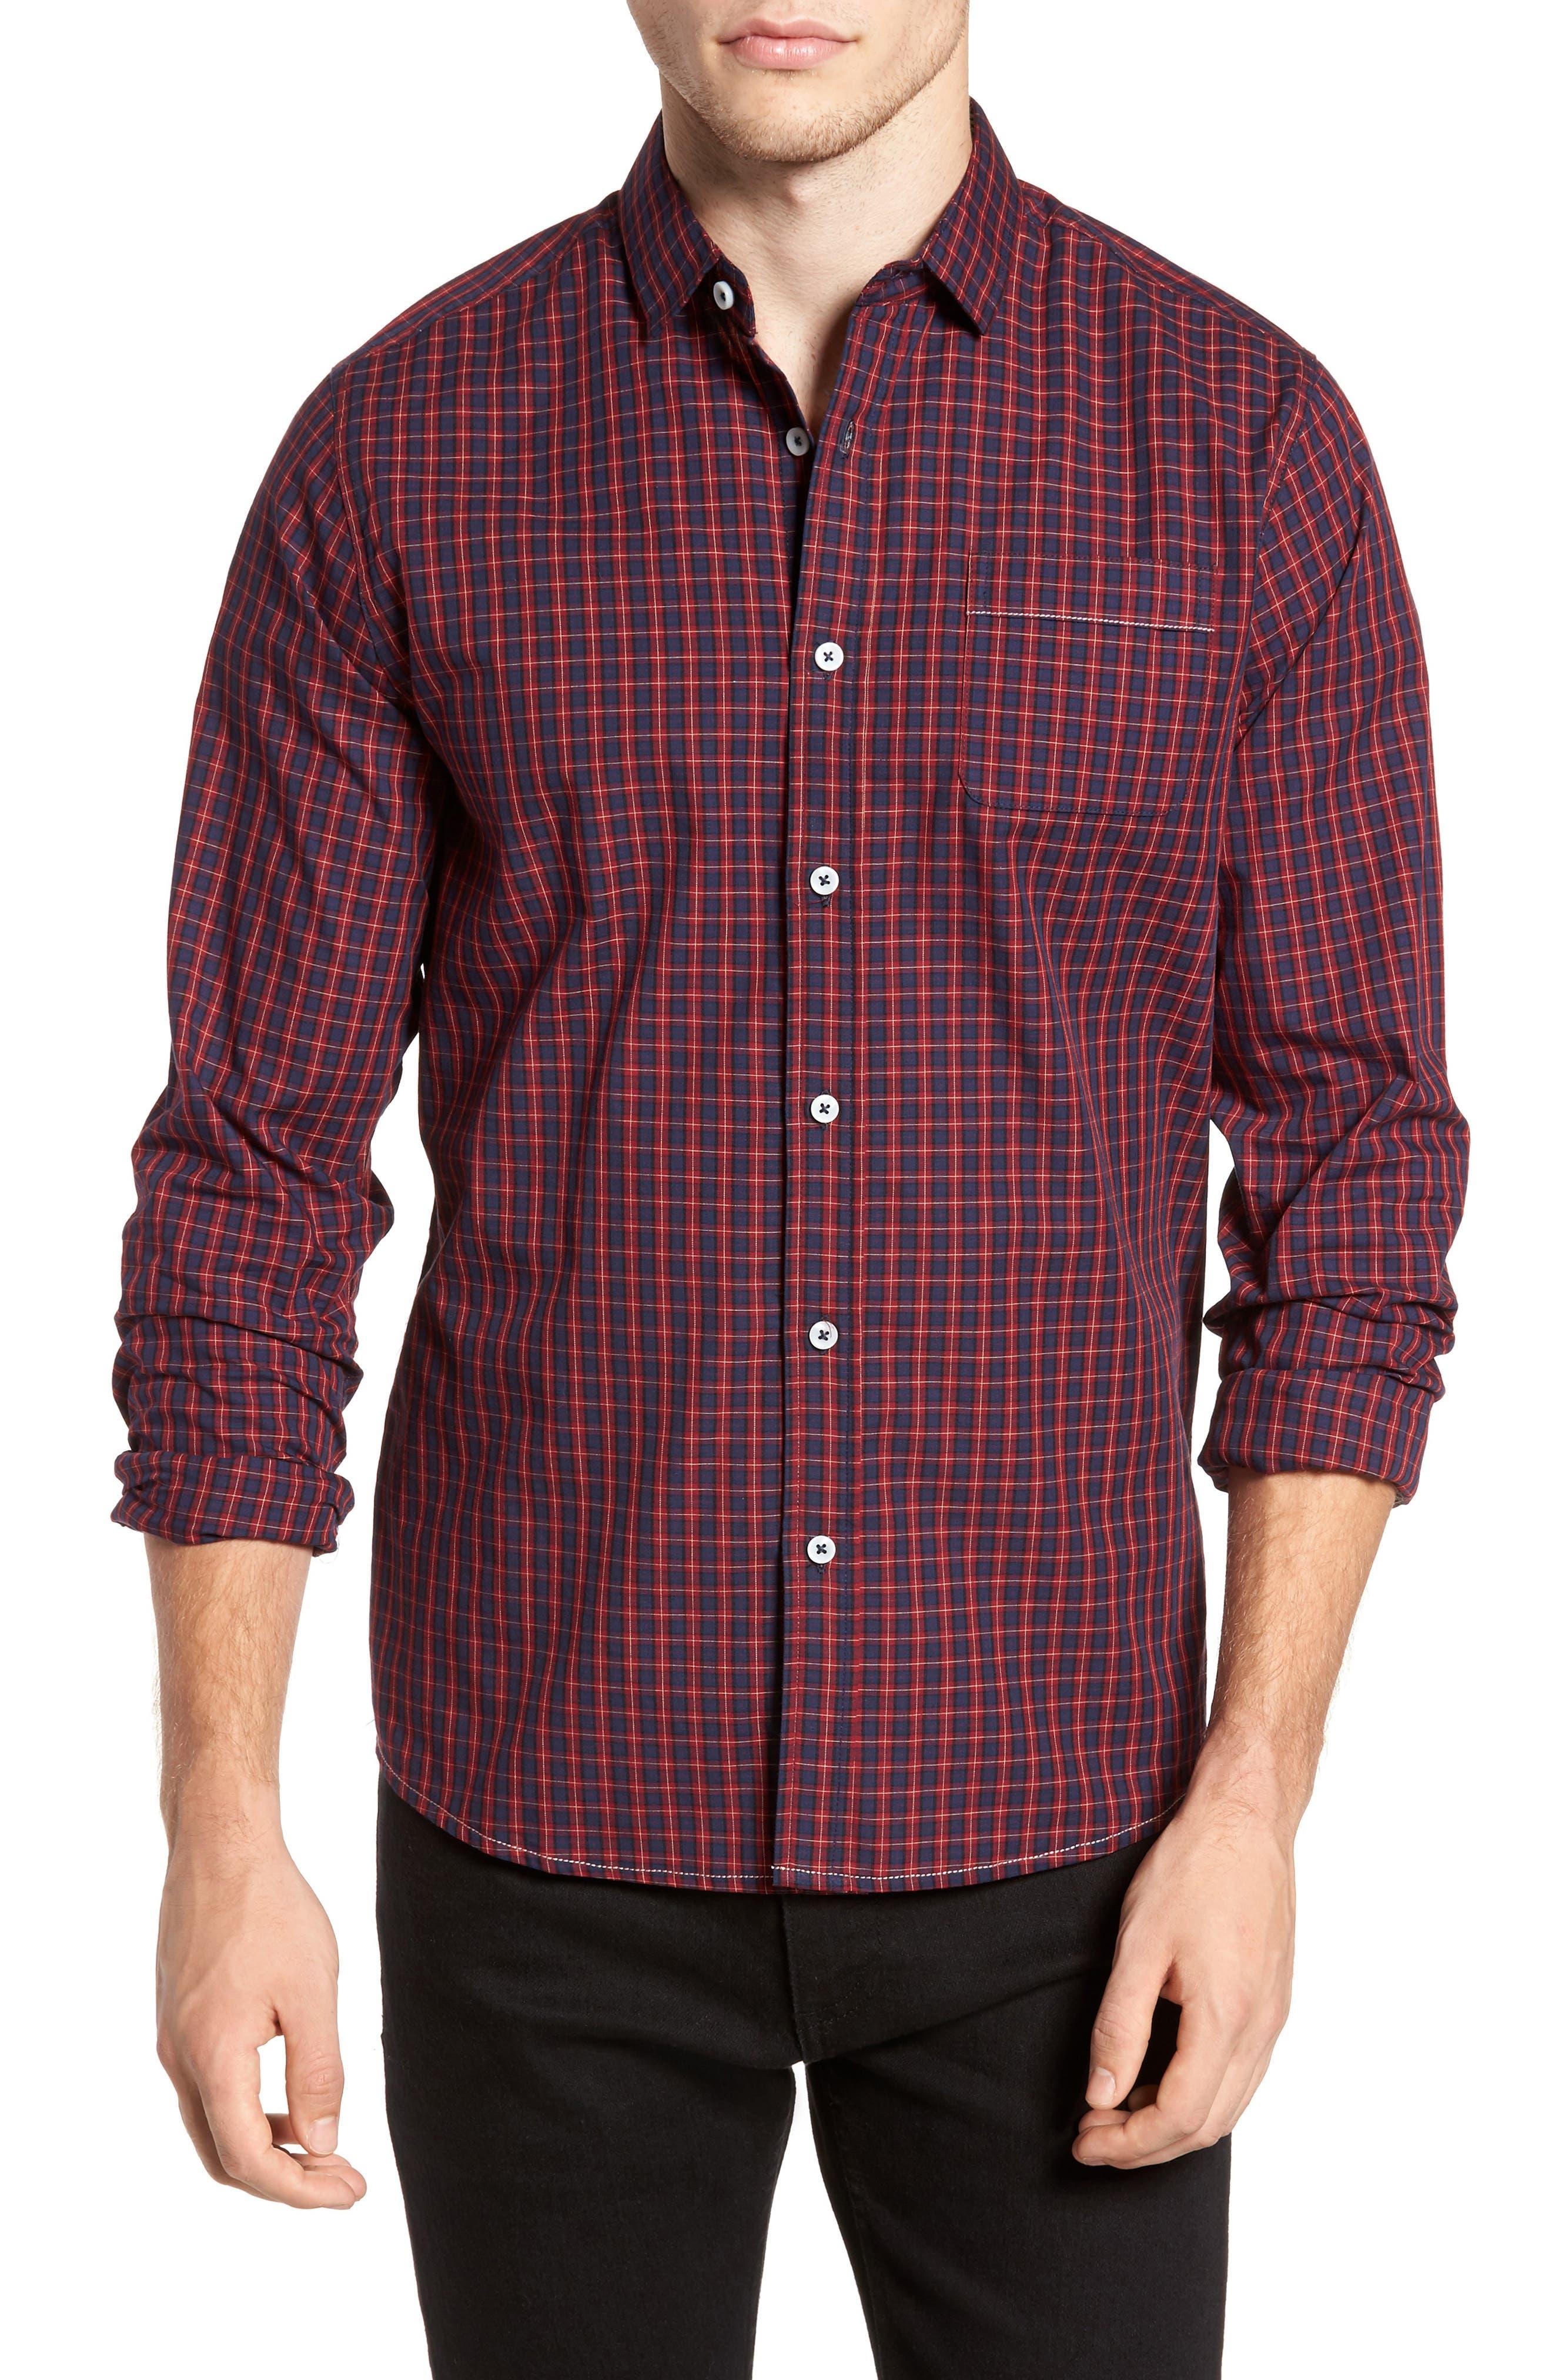 Tinto Plaid Woven Shirt,                             Main thumbnail 1, color,                             600